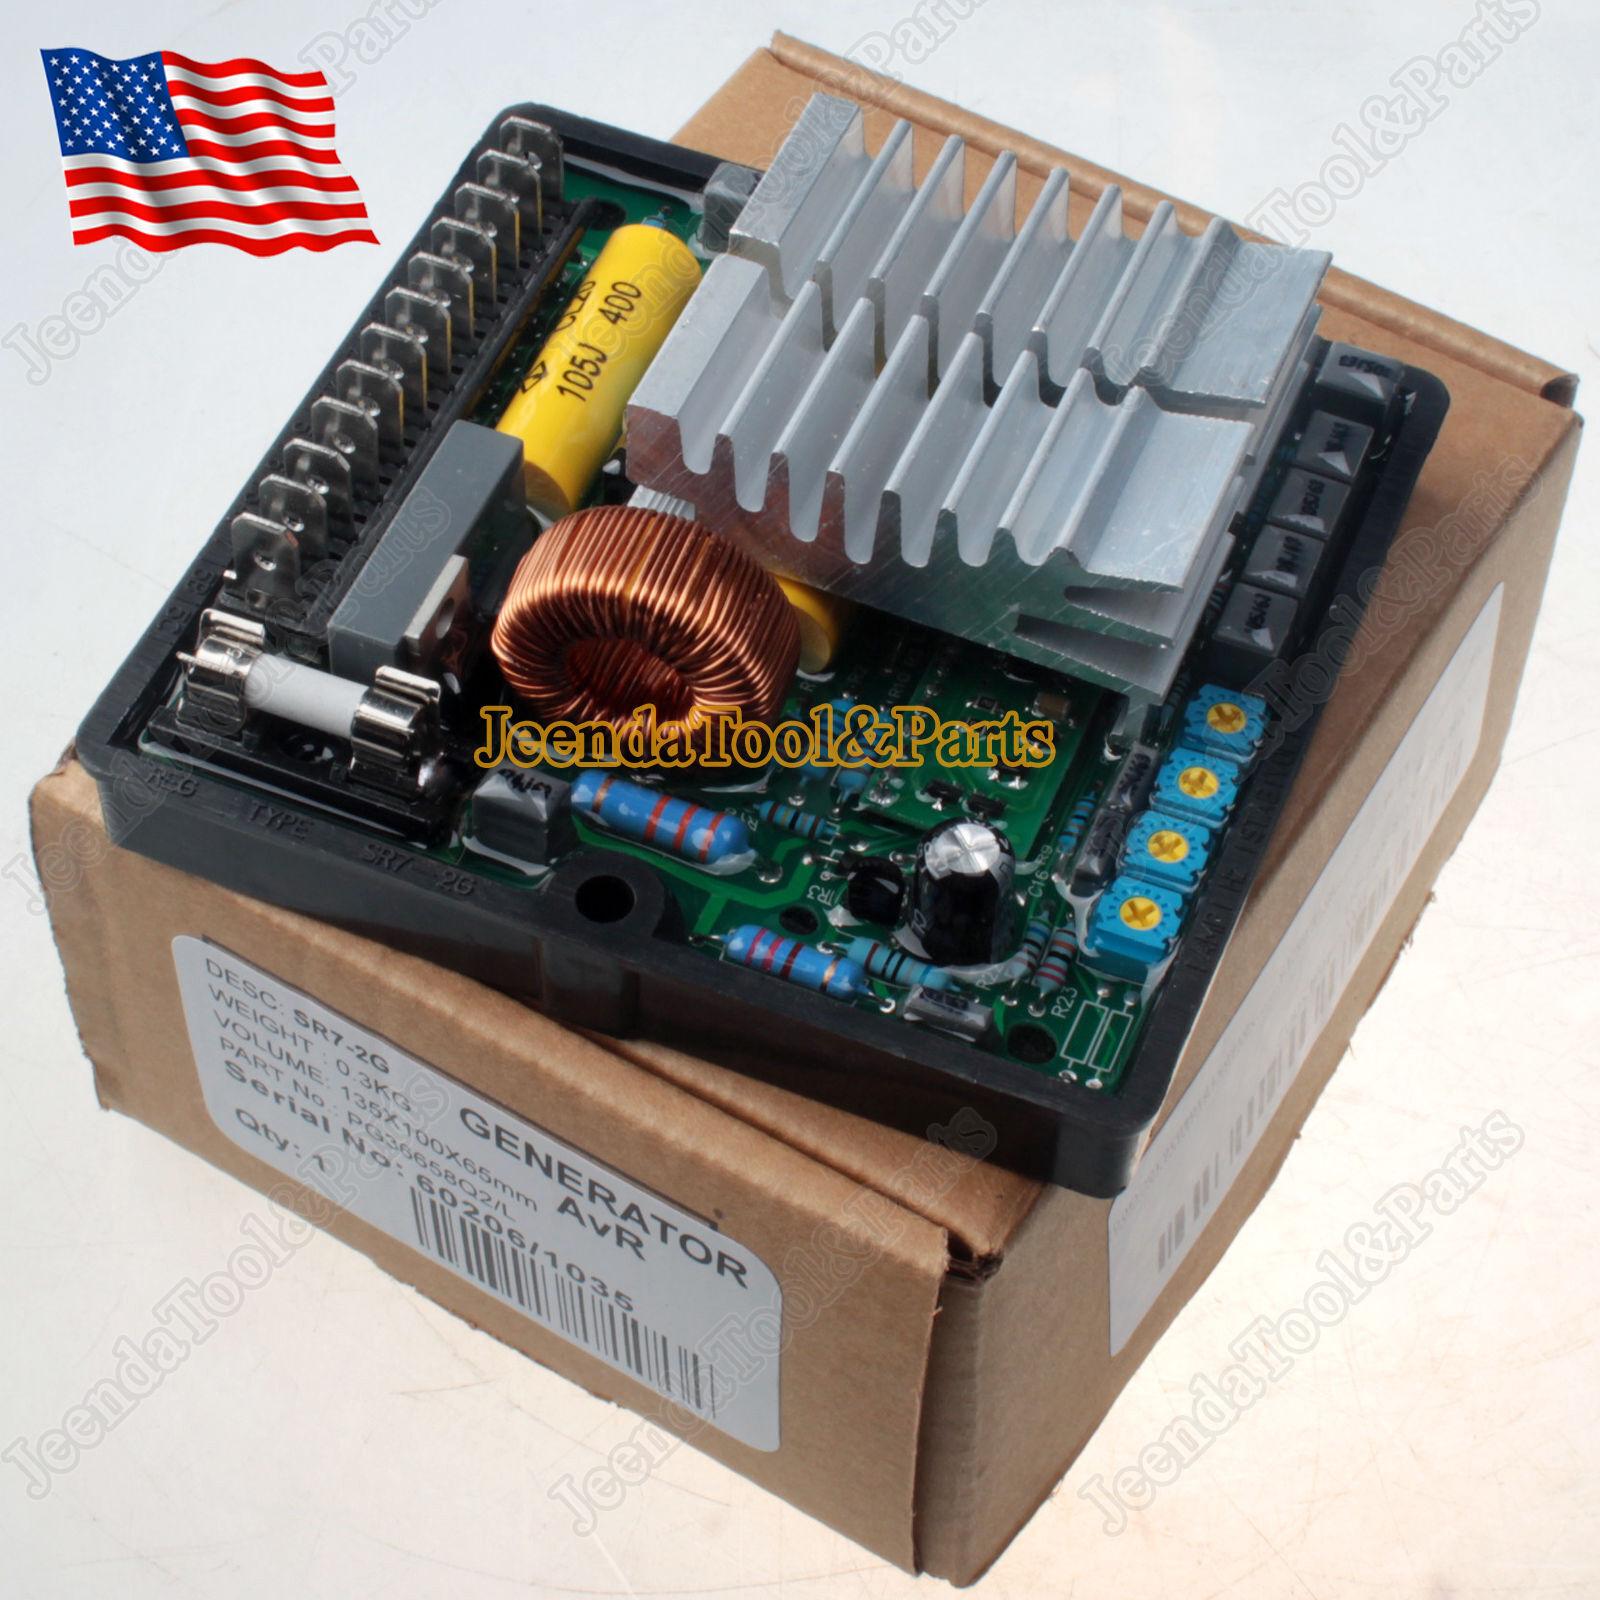 1pc Auto Voltage Regulator AVR SR7-2G For Mecc Alte Generators Practical